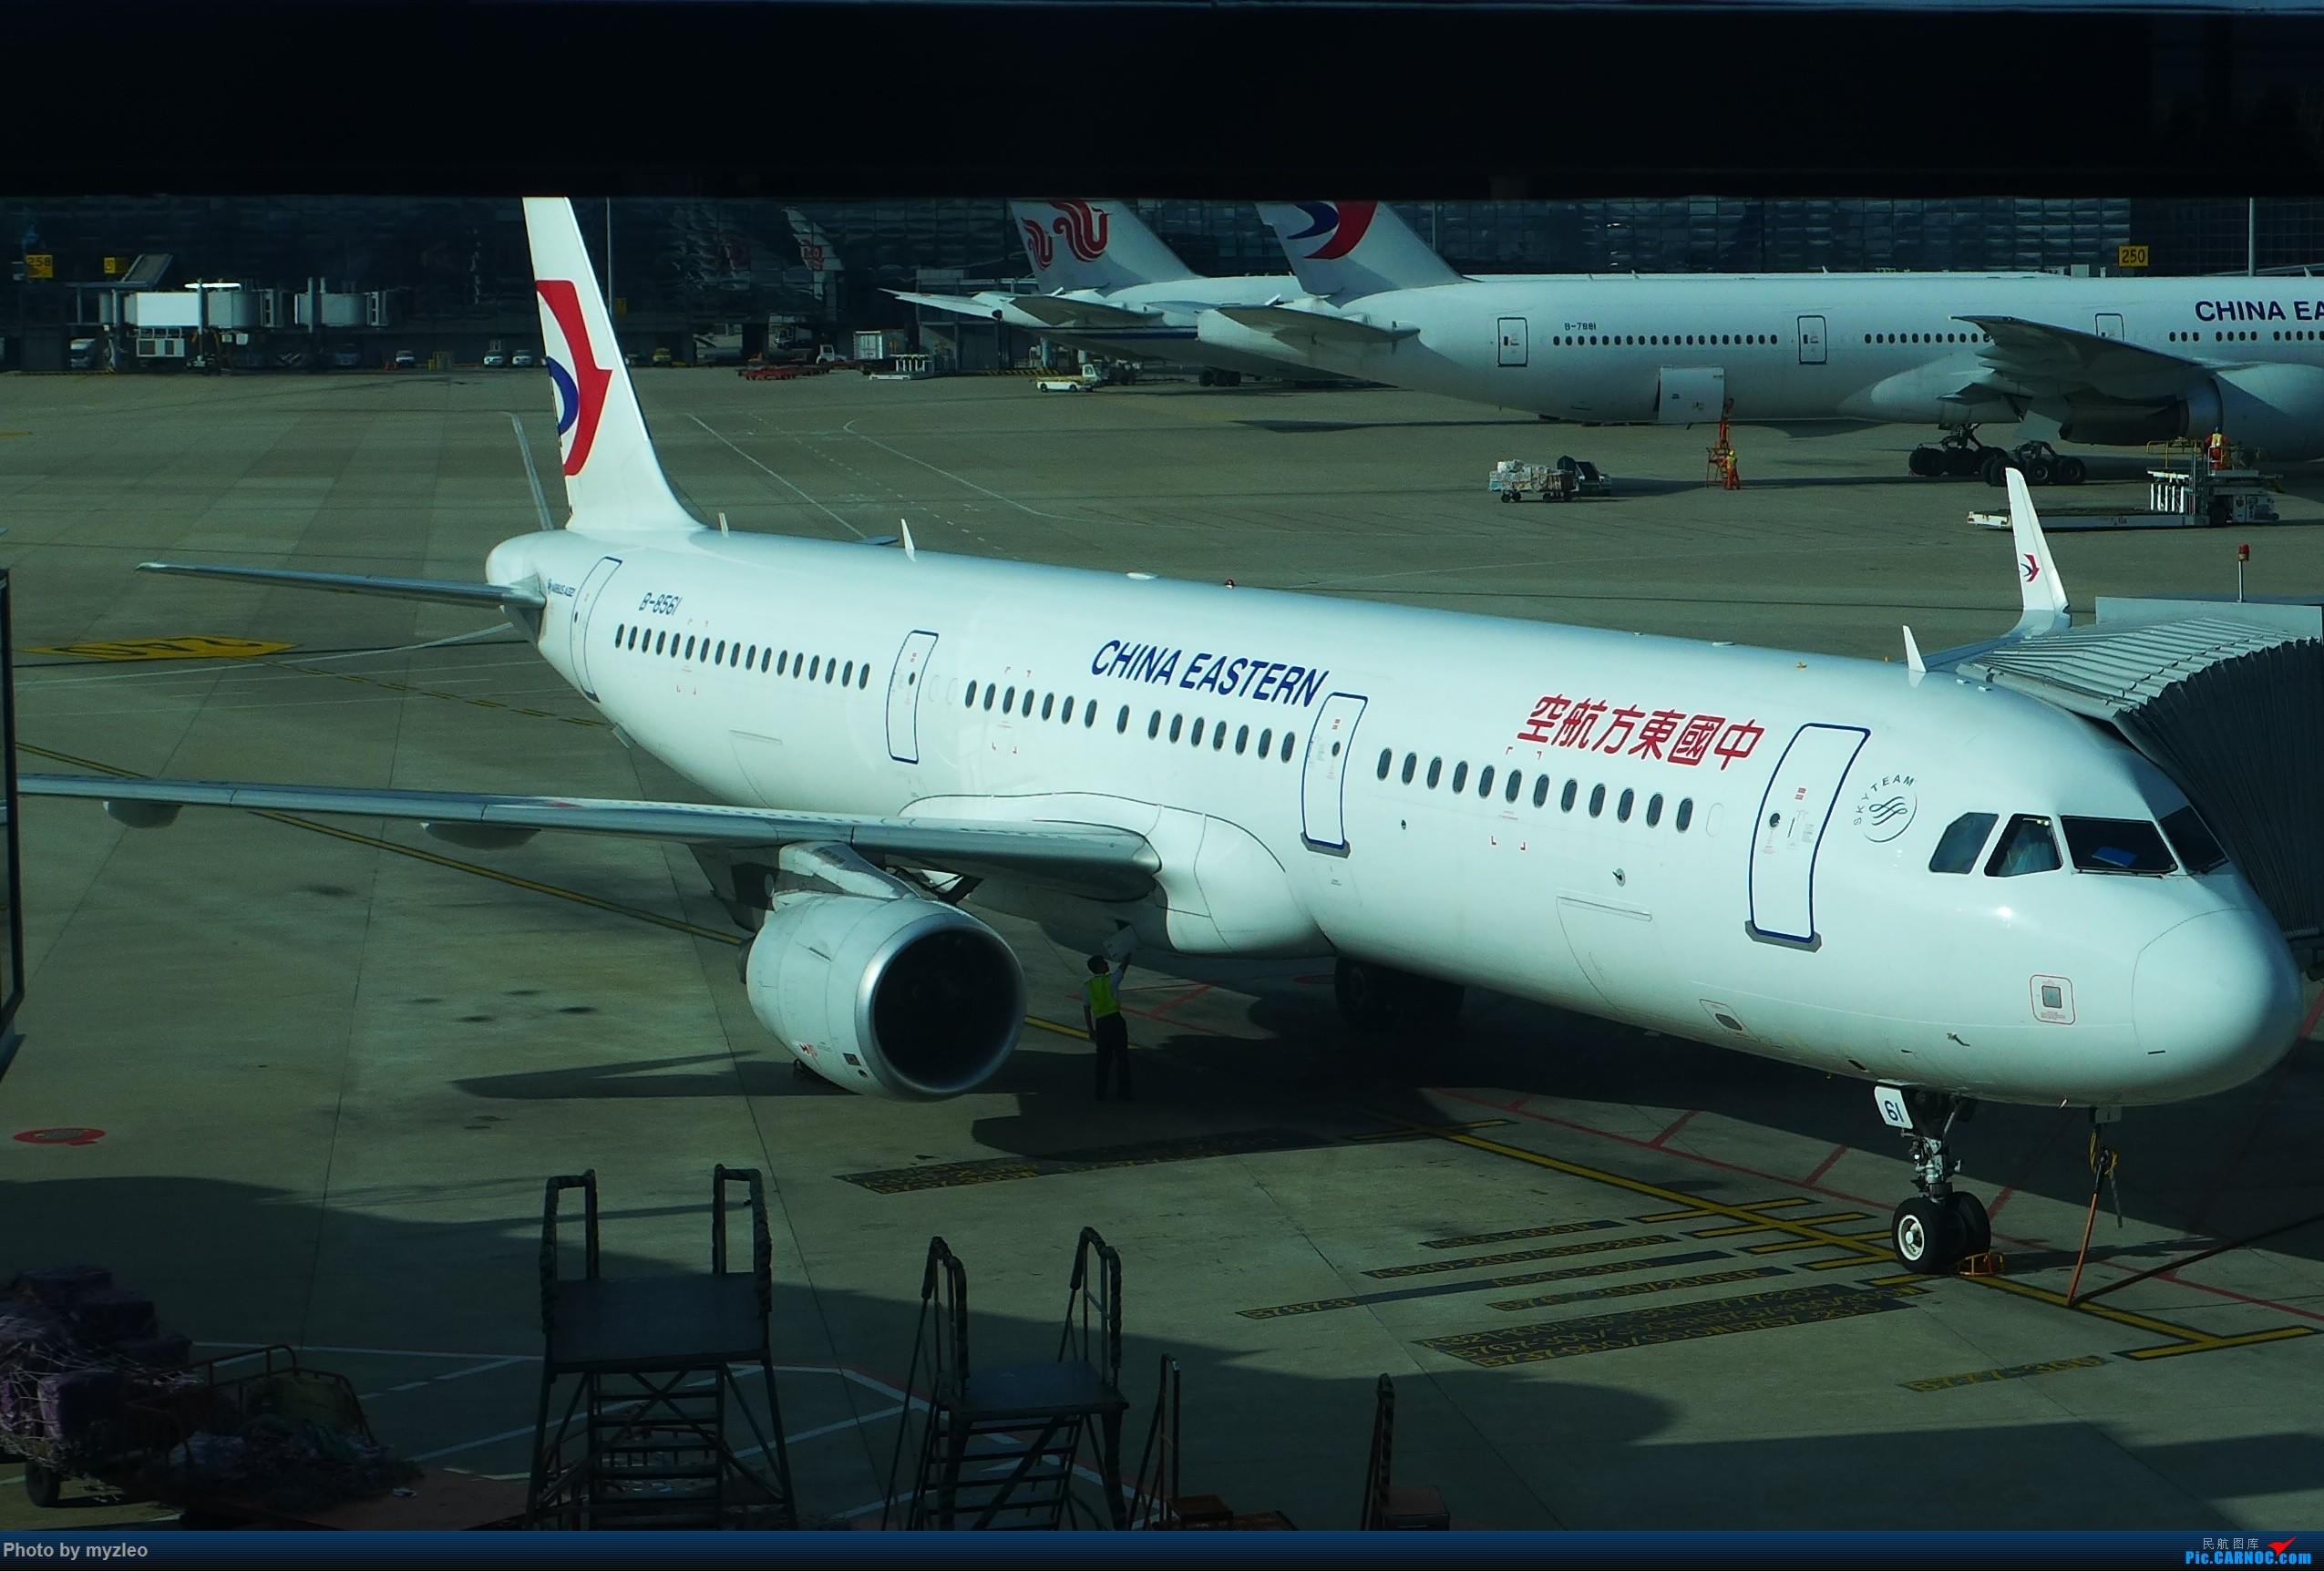 Re:[原创]【myzleo的游记2.1】昆洱风光(1)——SHA-KMG上航商务舱再体验+人在昆明 AIRBUS A321-200 B-8561 中国上海虹桥国际机场